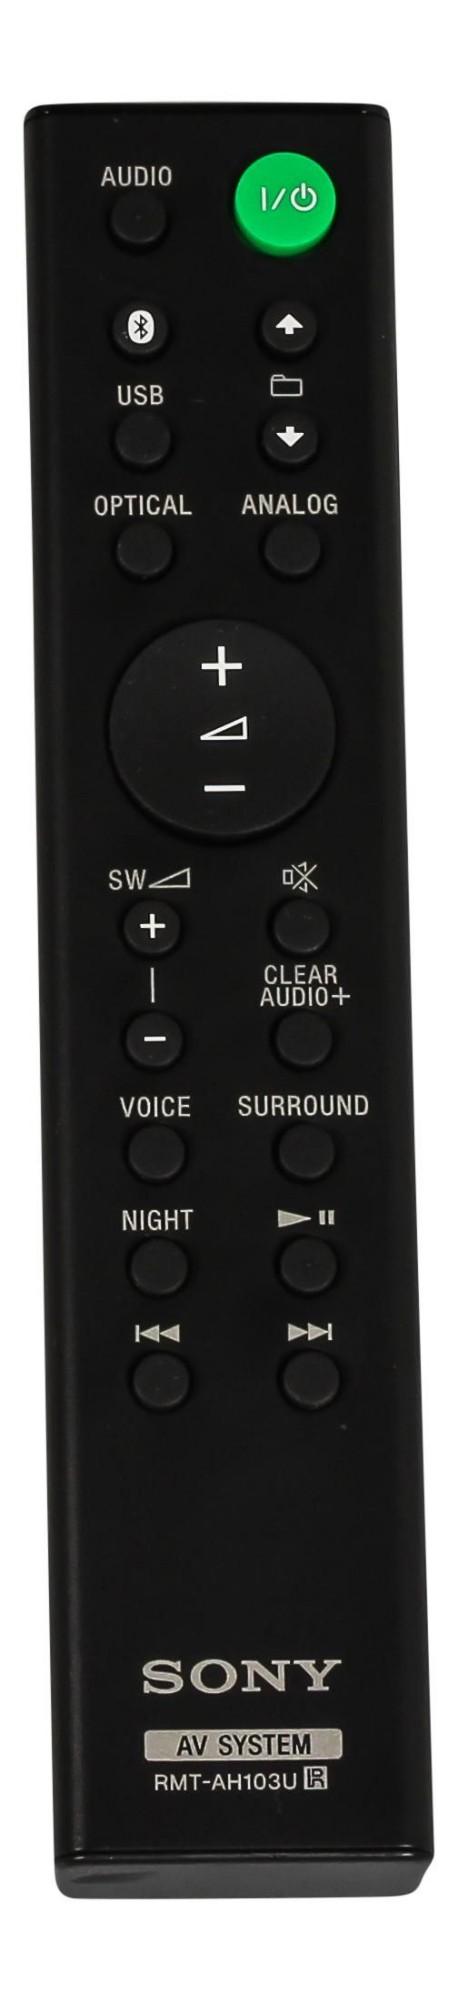 Sony Remote Commander (RMT-AH103U)